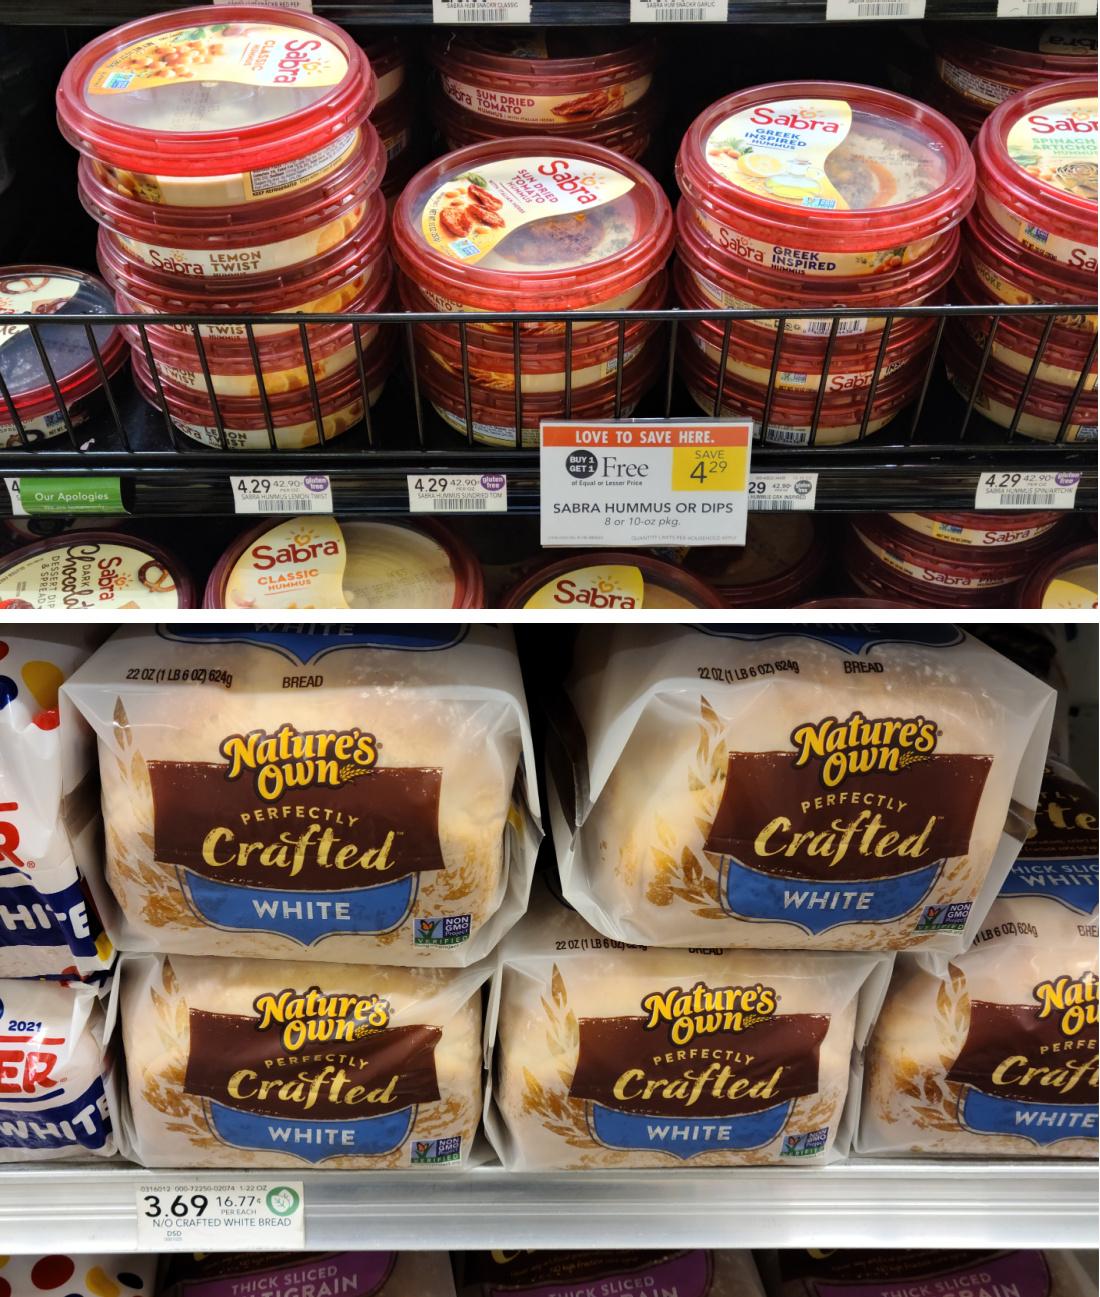 Sabra Hummus + Nature's Own Bread = Just $3.84 Total At Publix on I Heart Publix